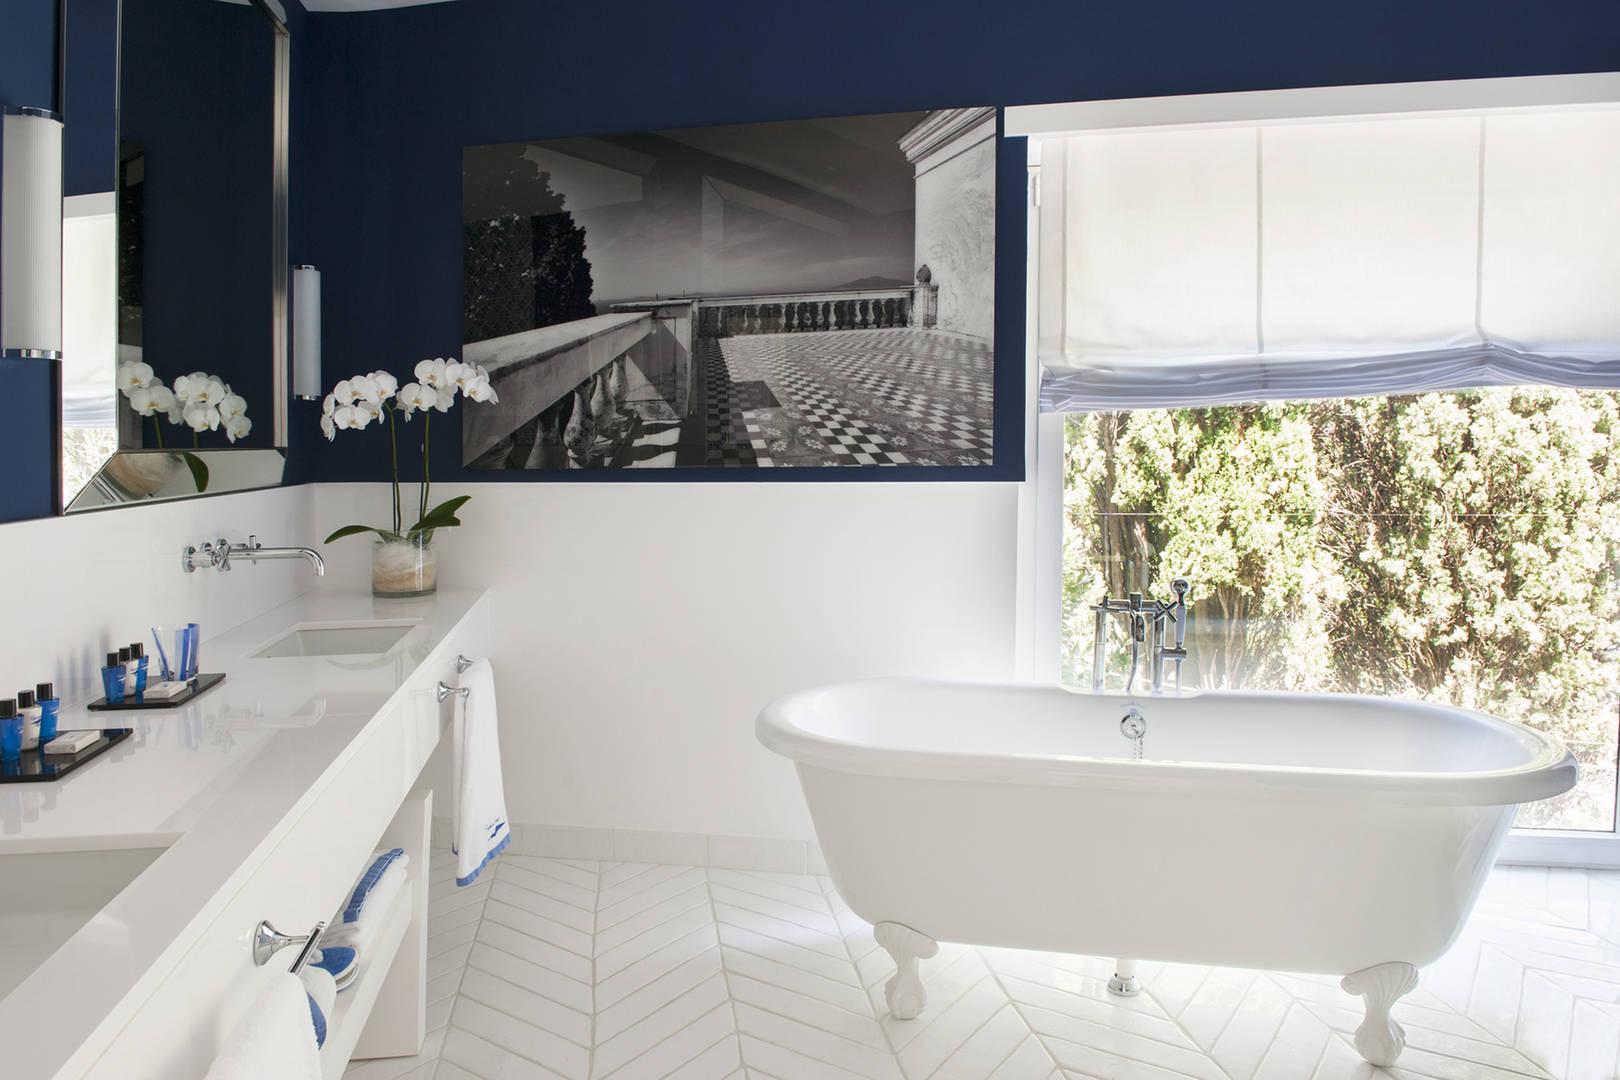 Capritouch Executive Bathroom